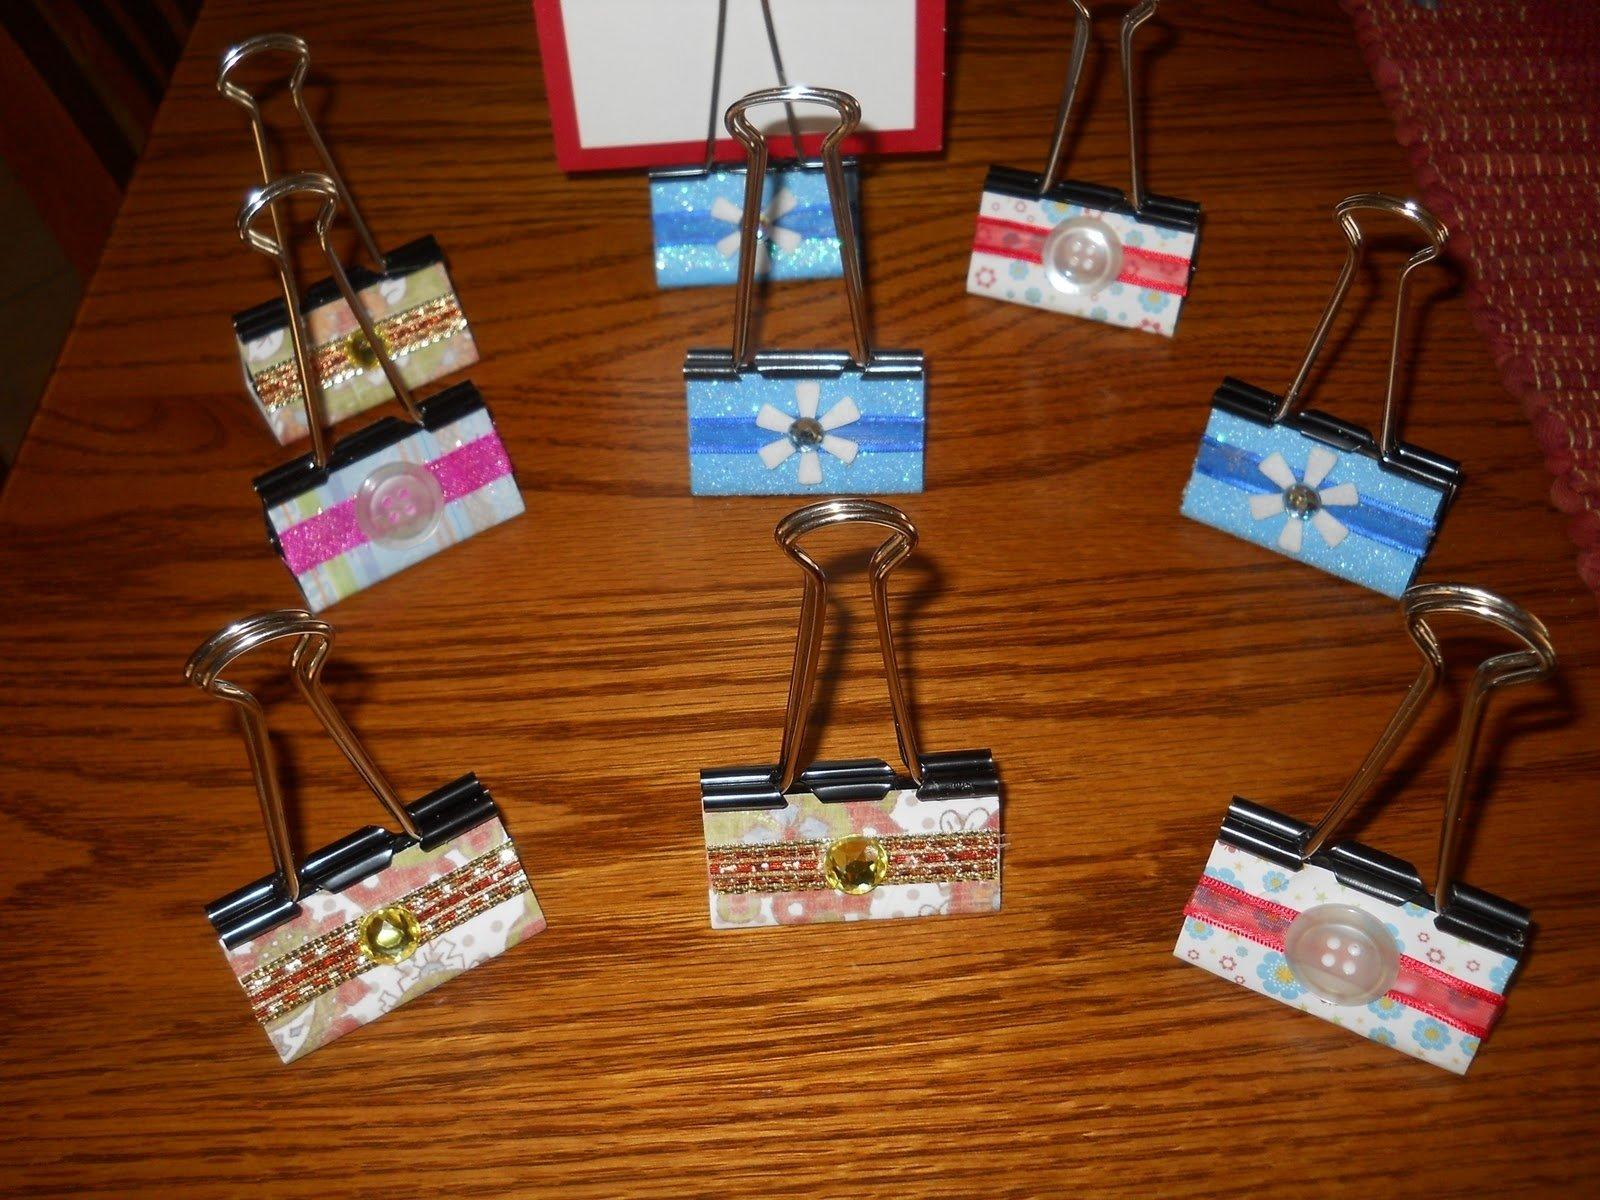 10 Stunning Co Worker Christmas Gift Ideas blog hoppin christmas gift ideas and polar express freebie 1